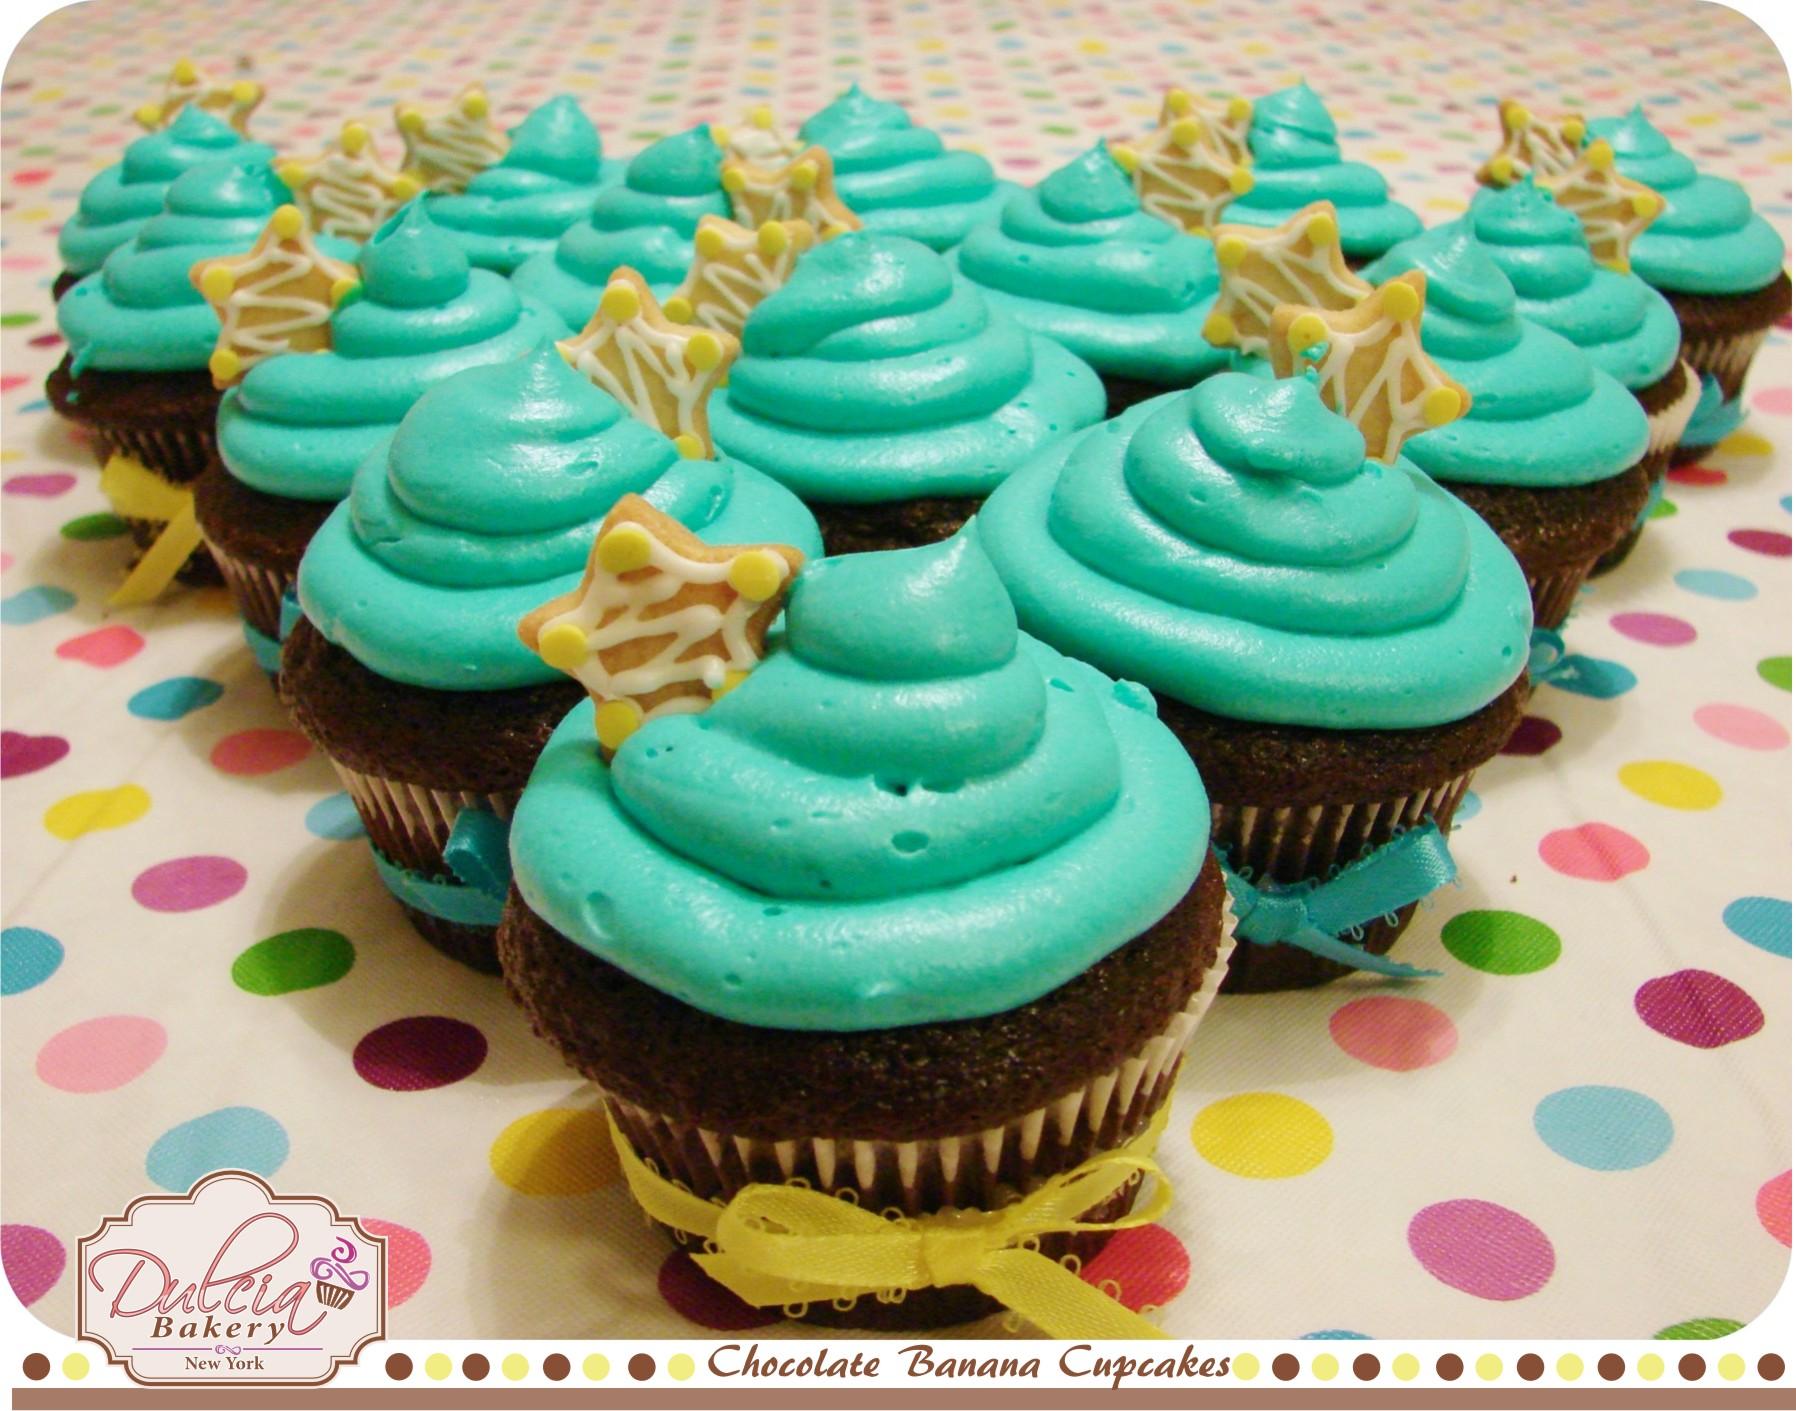 Cupcake Designs We Create Your Cupcake Ideas Cupcake Ideas For You